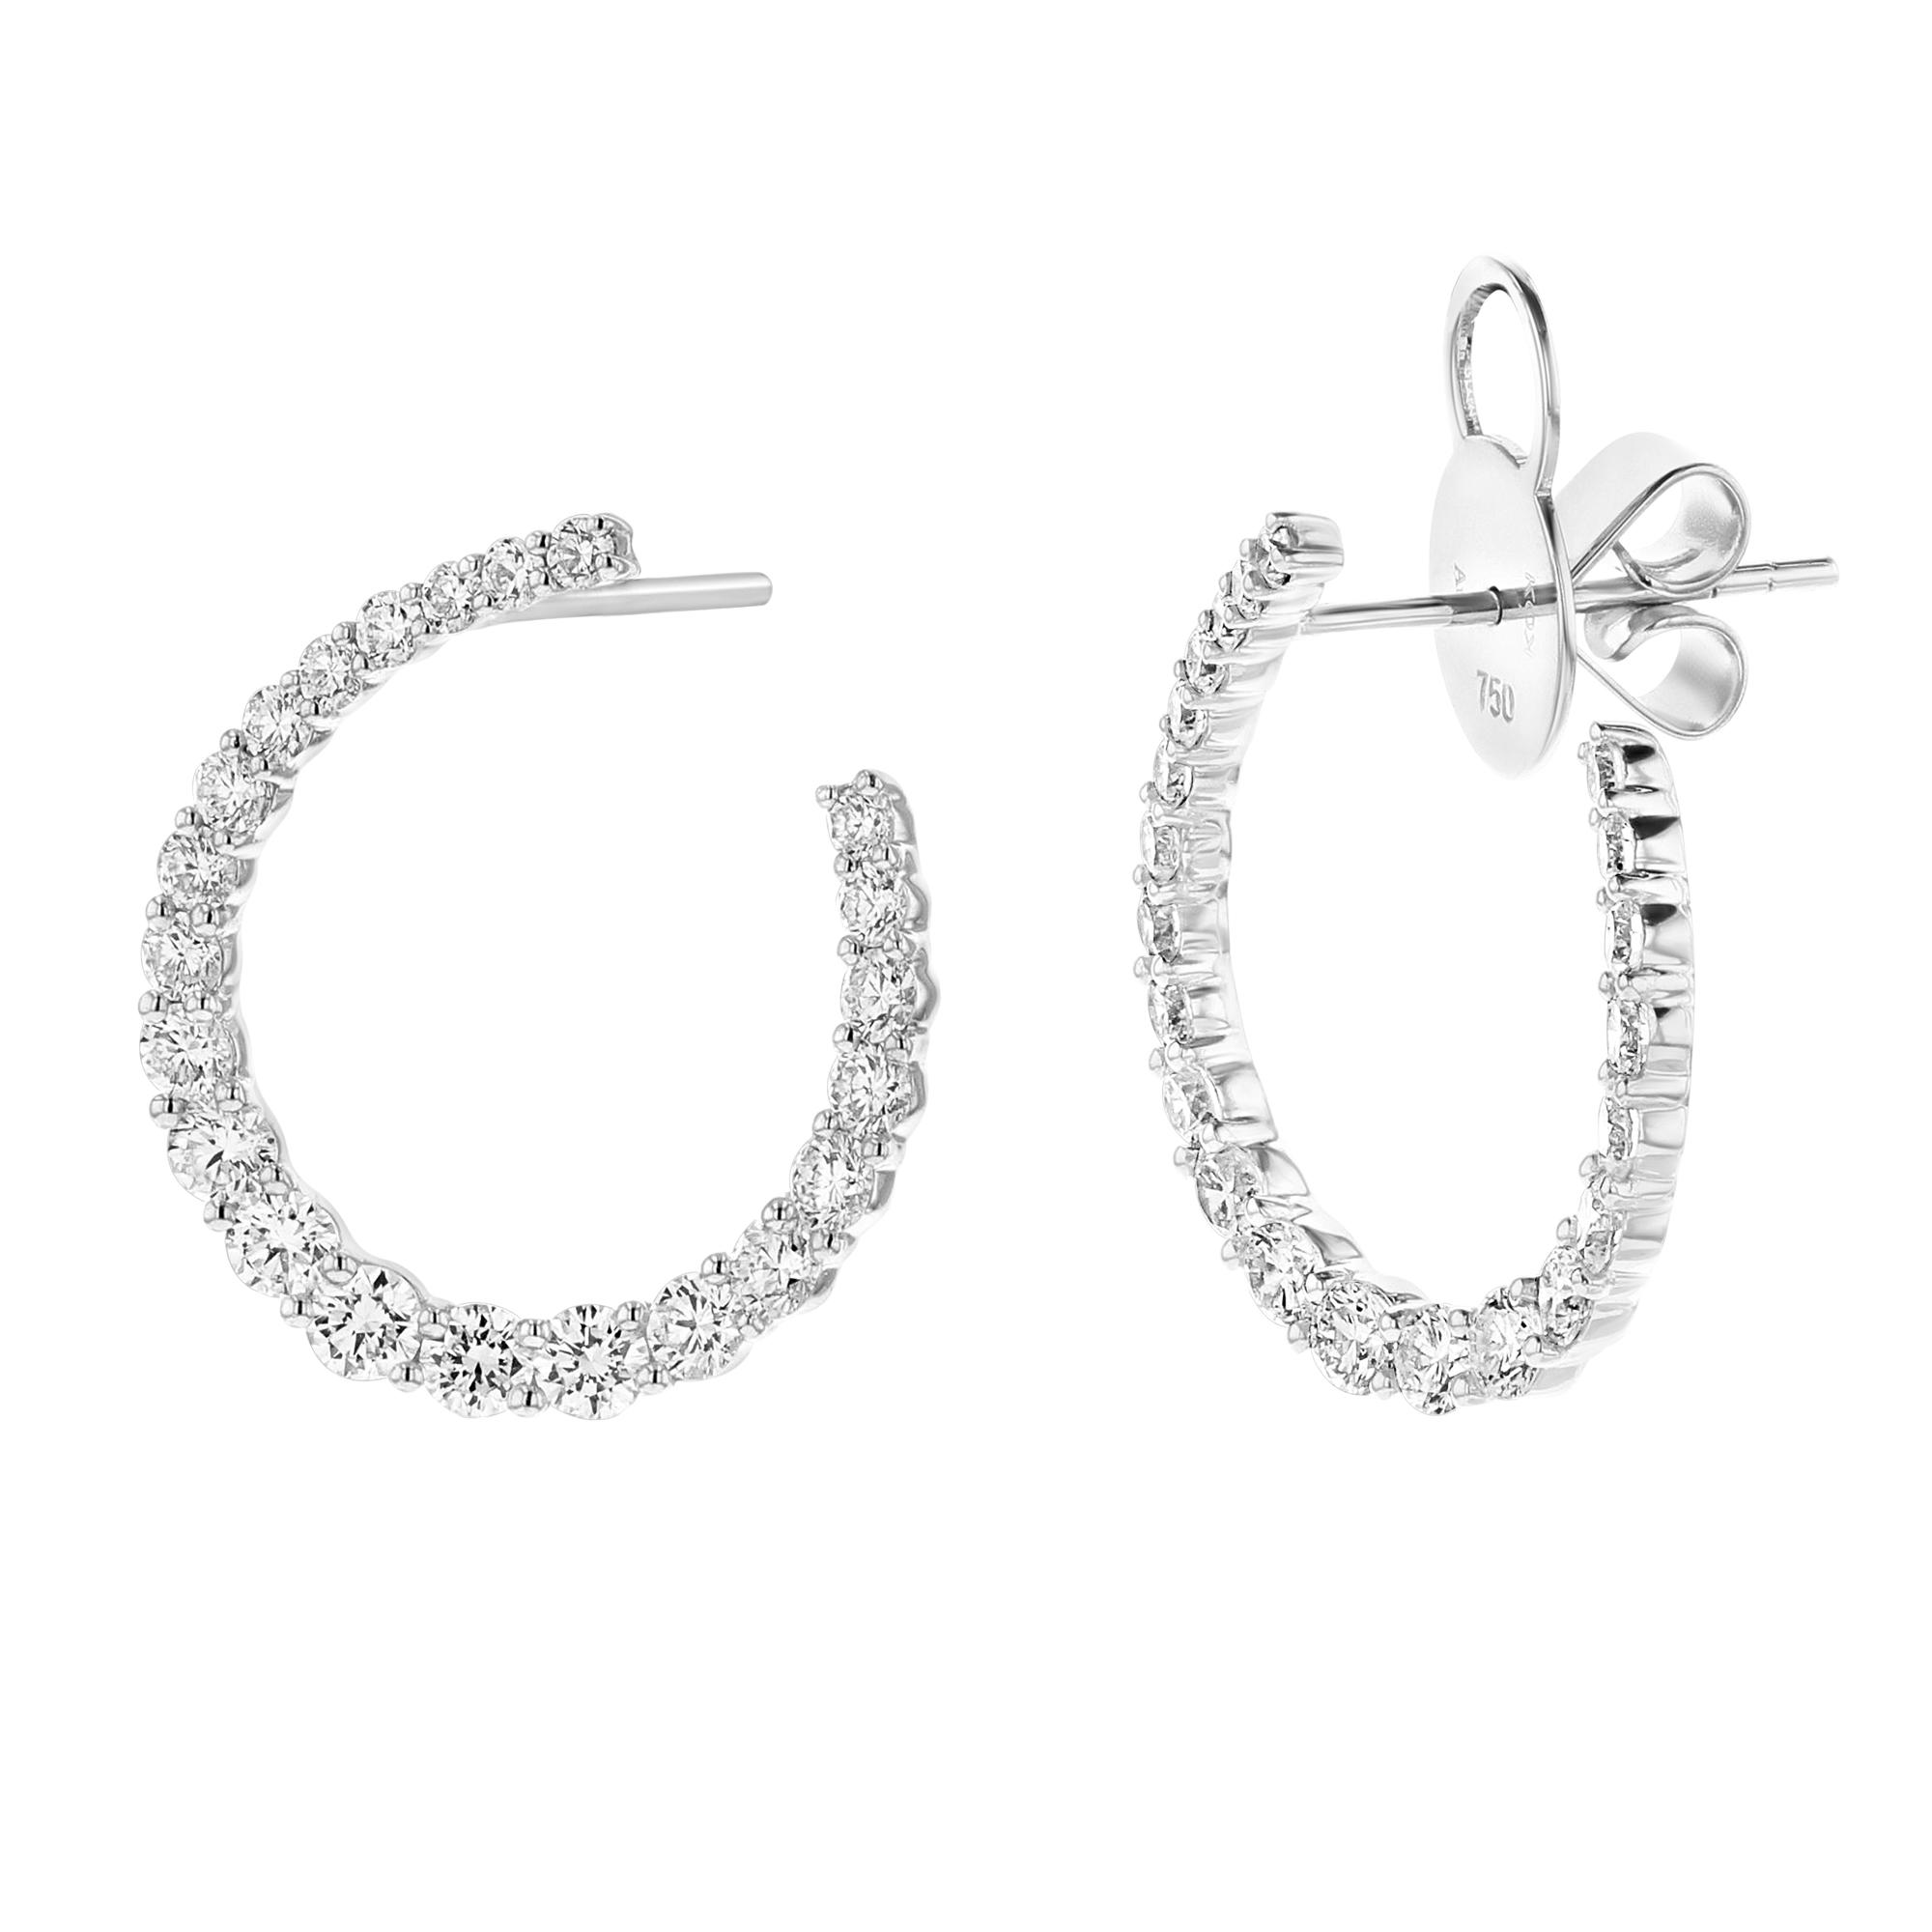 View 1.91ctw Diamond Fashion Earrings in 18k White Gold